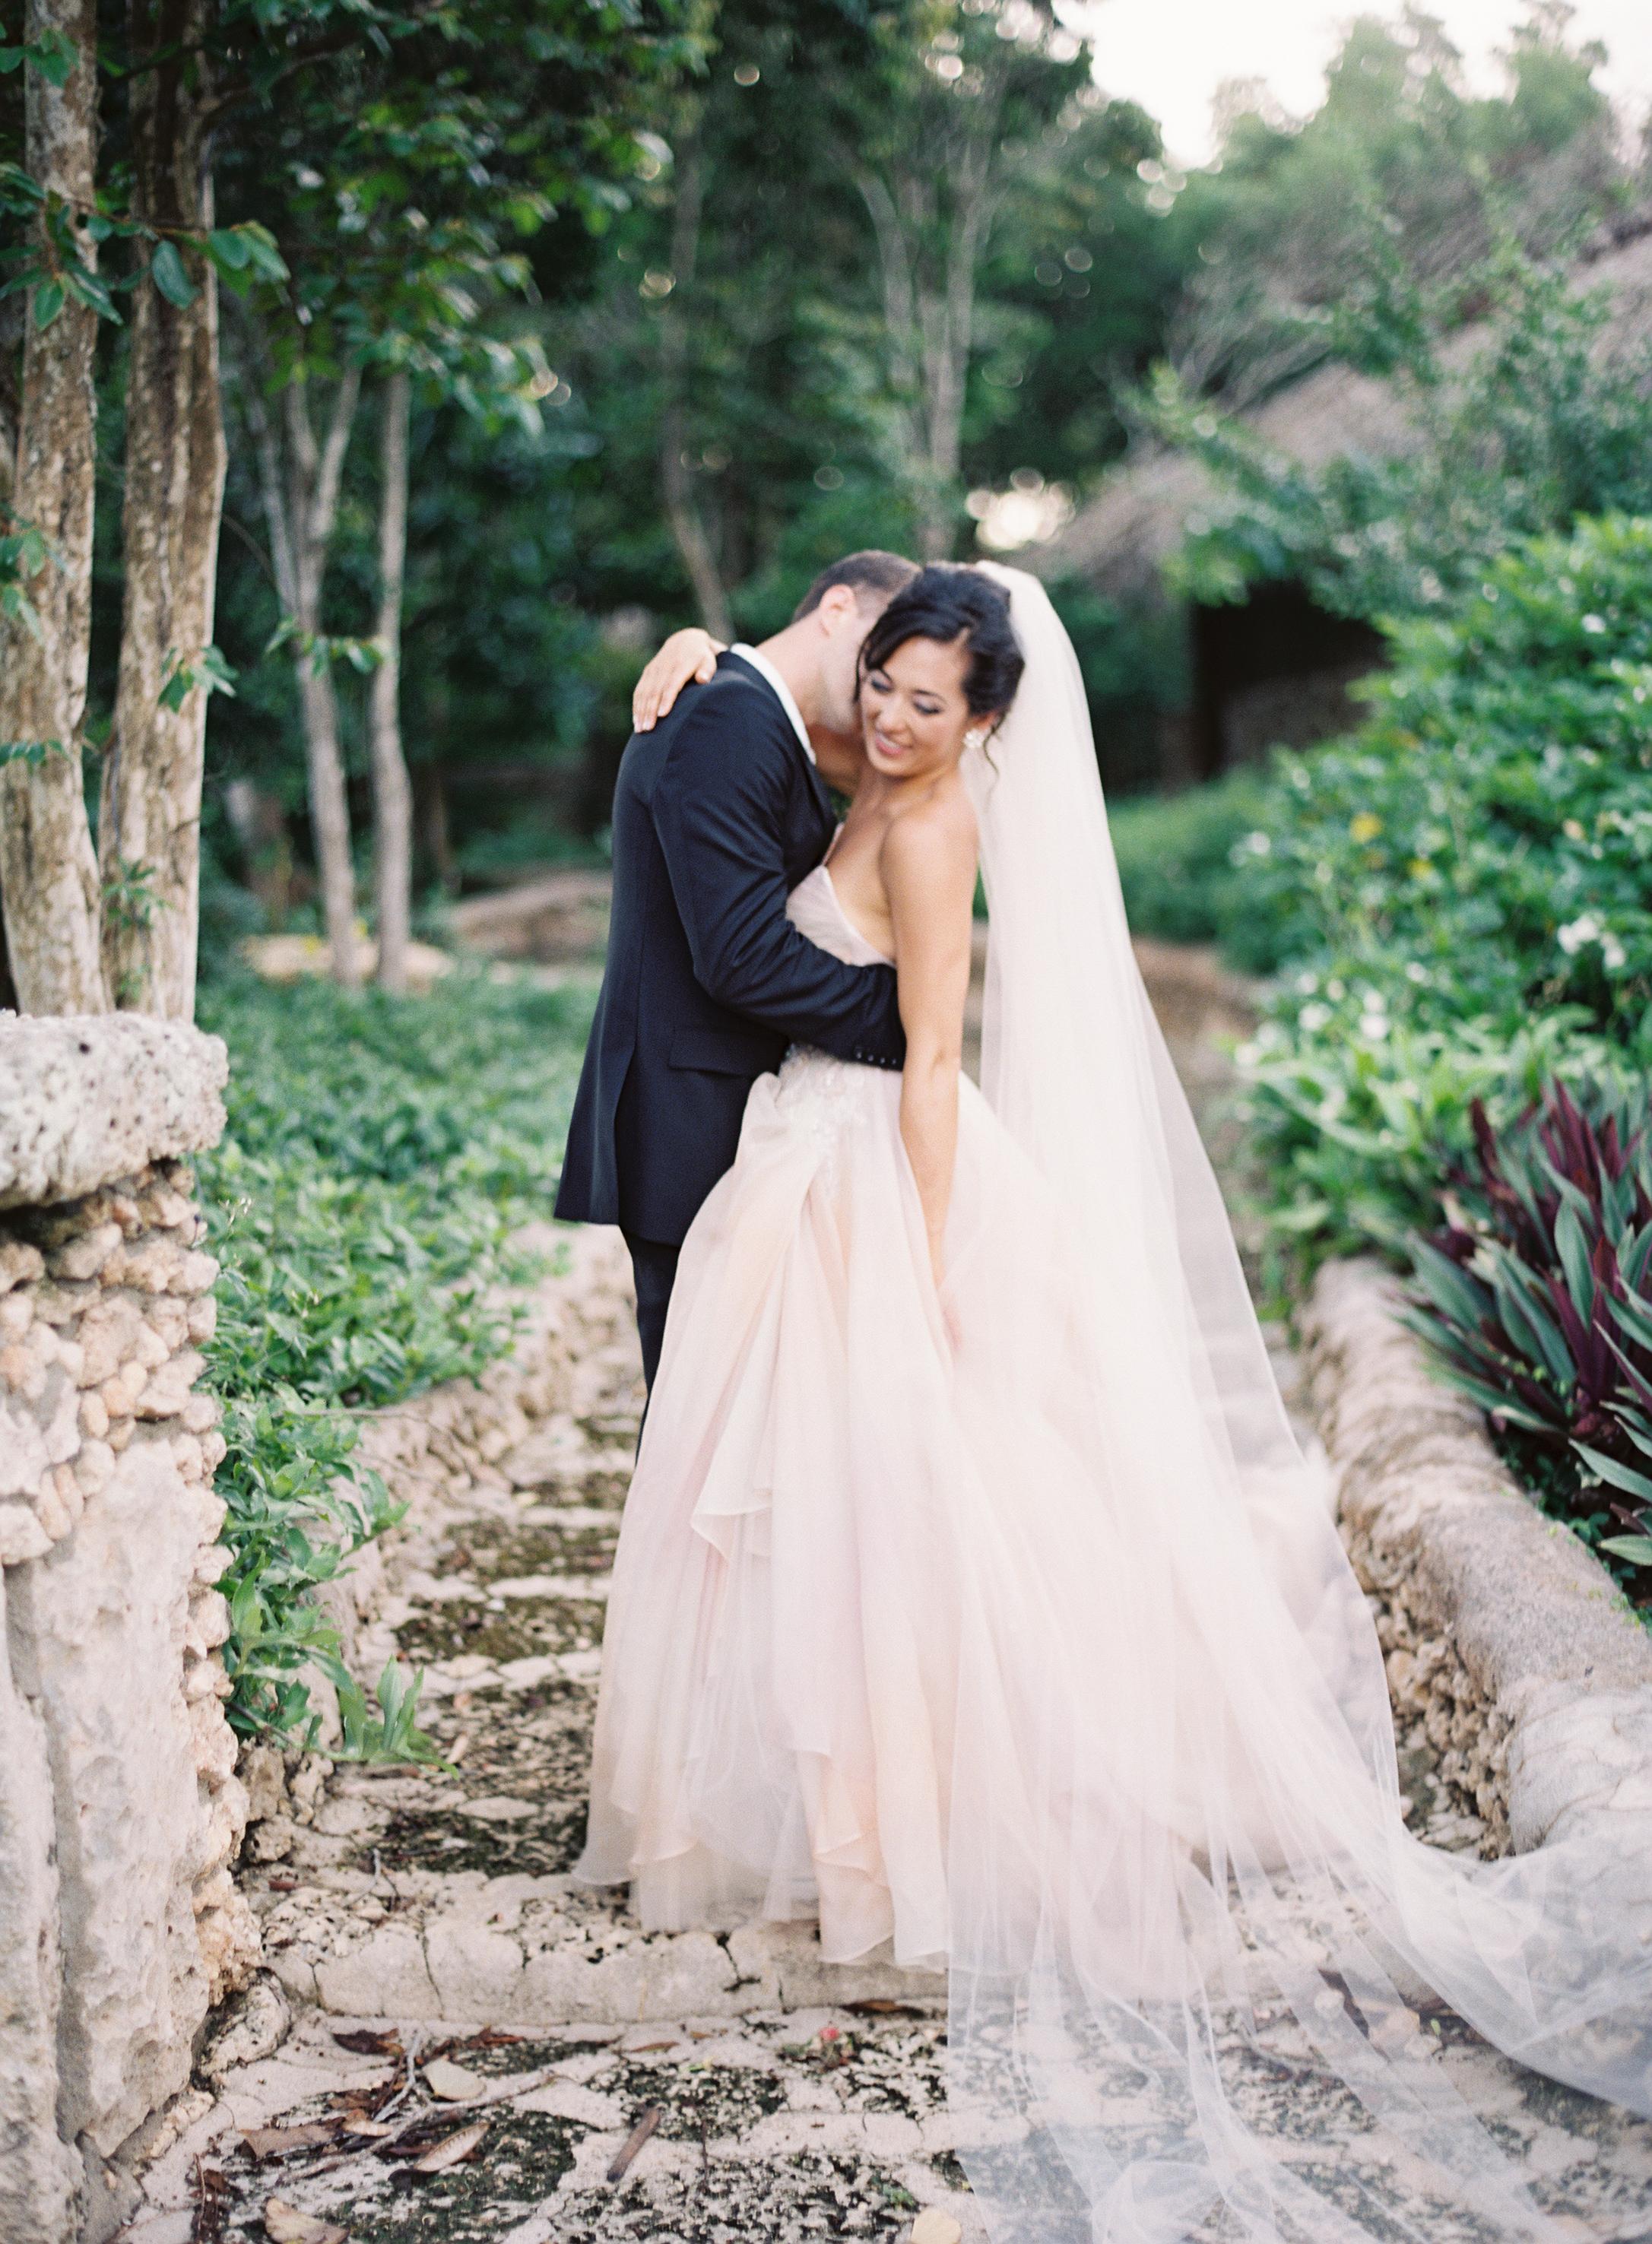 Ashleigh and Brian-Wedding Day-Carrie King Photographer-500.jpg